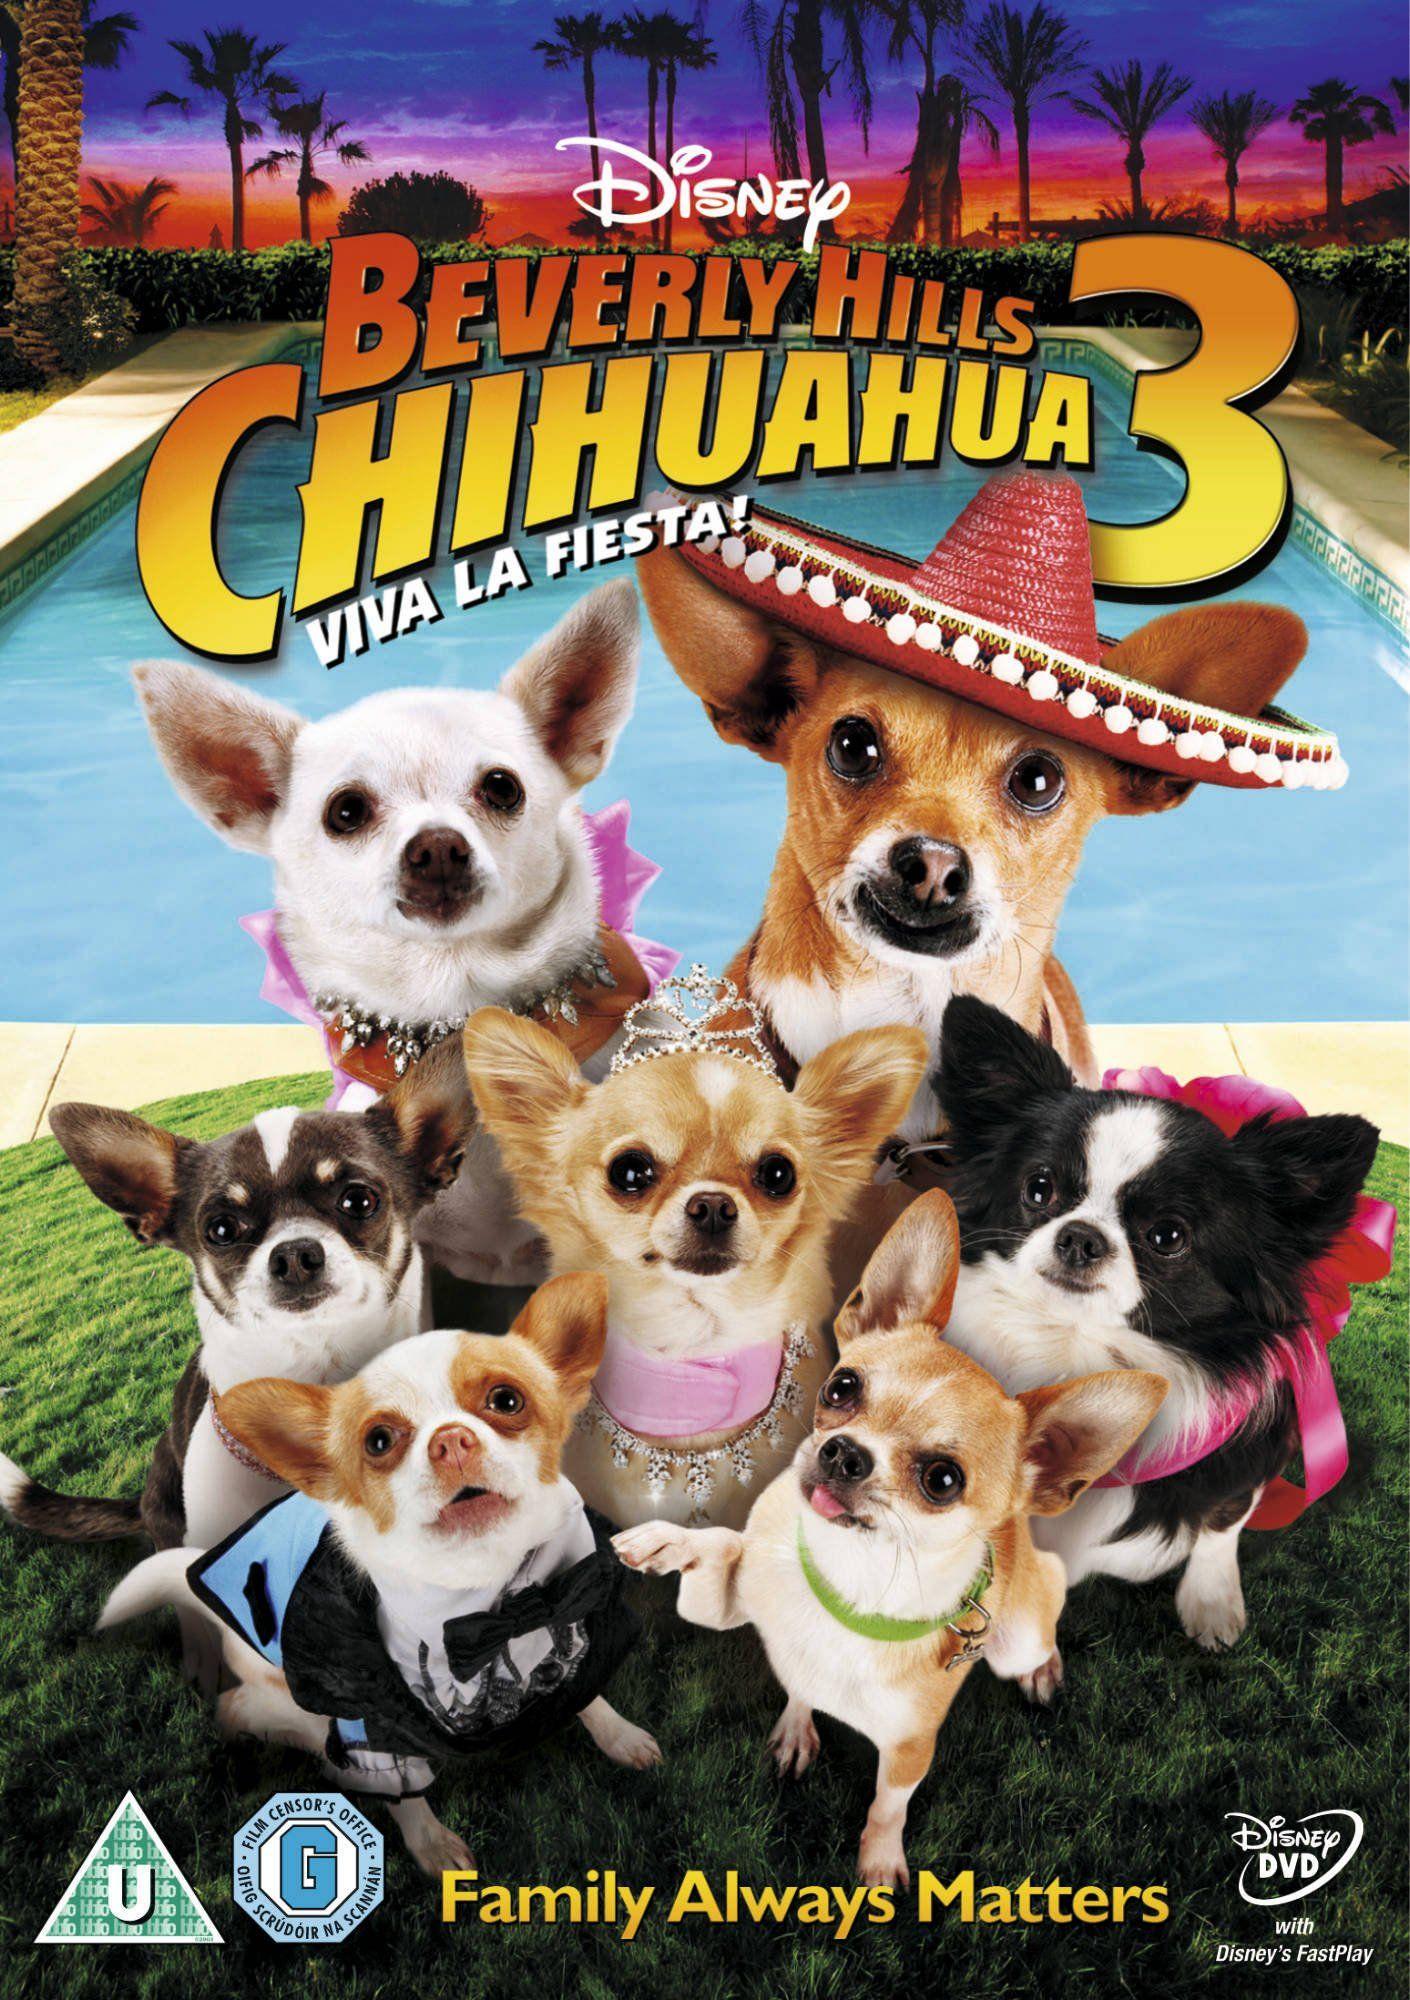 Beverly Hills Chihuahua 3 Reino Unido Dvd Chihuahua Hills